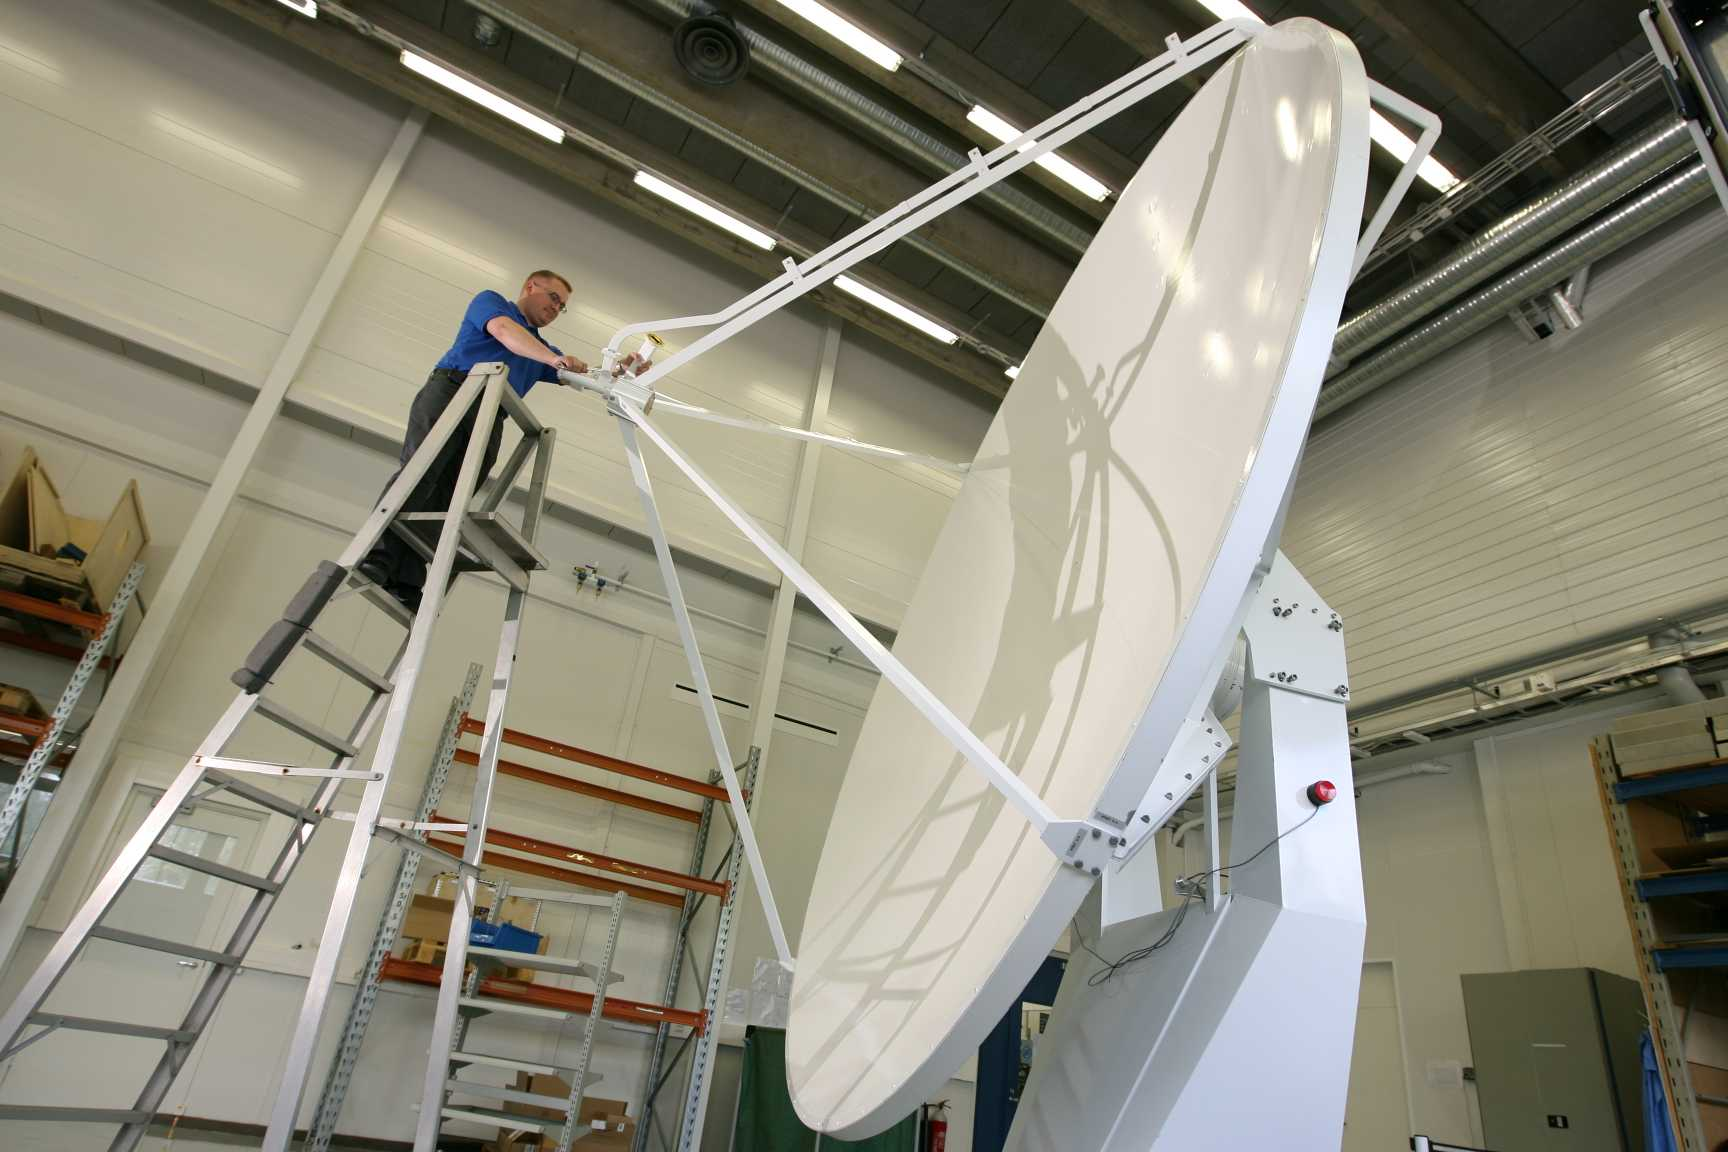 Vaisala announces donation of new weather radar equipment ...